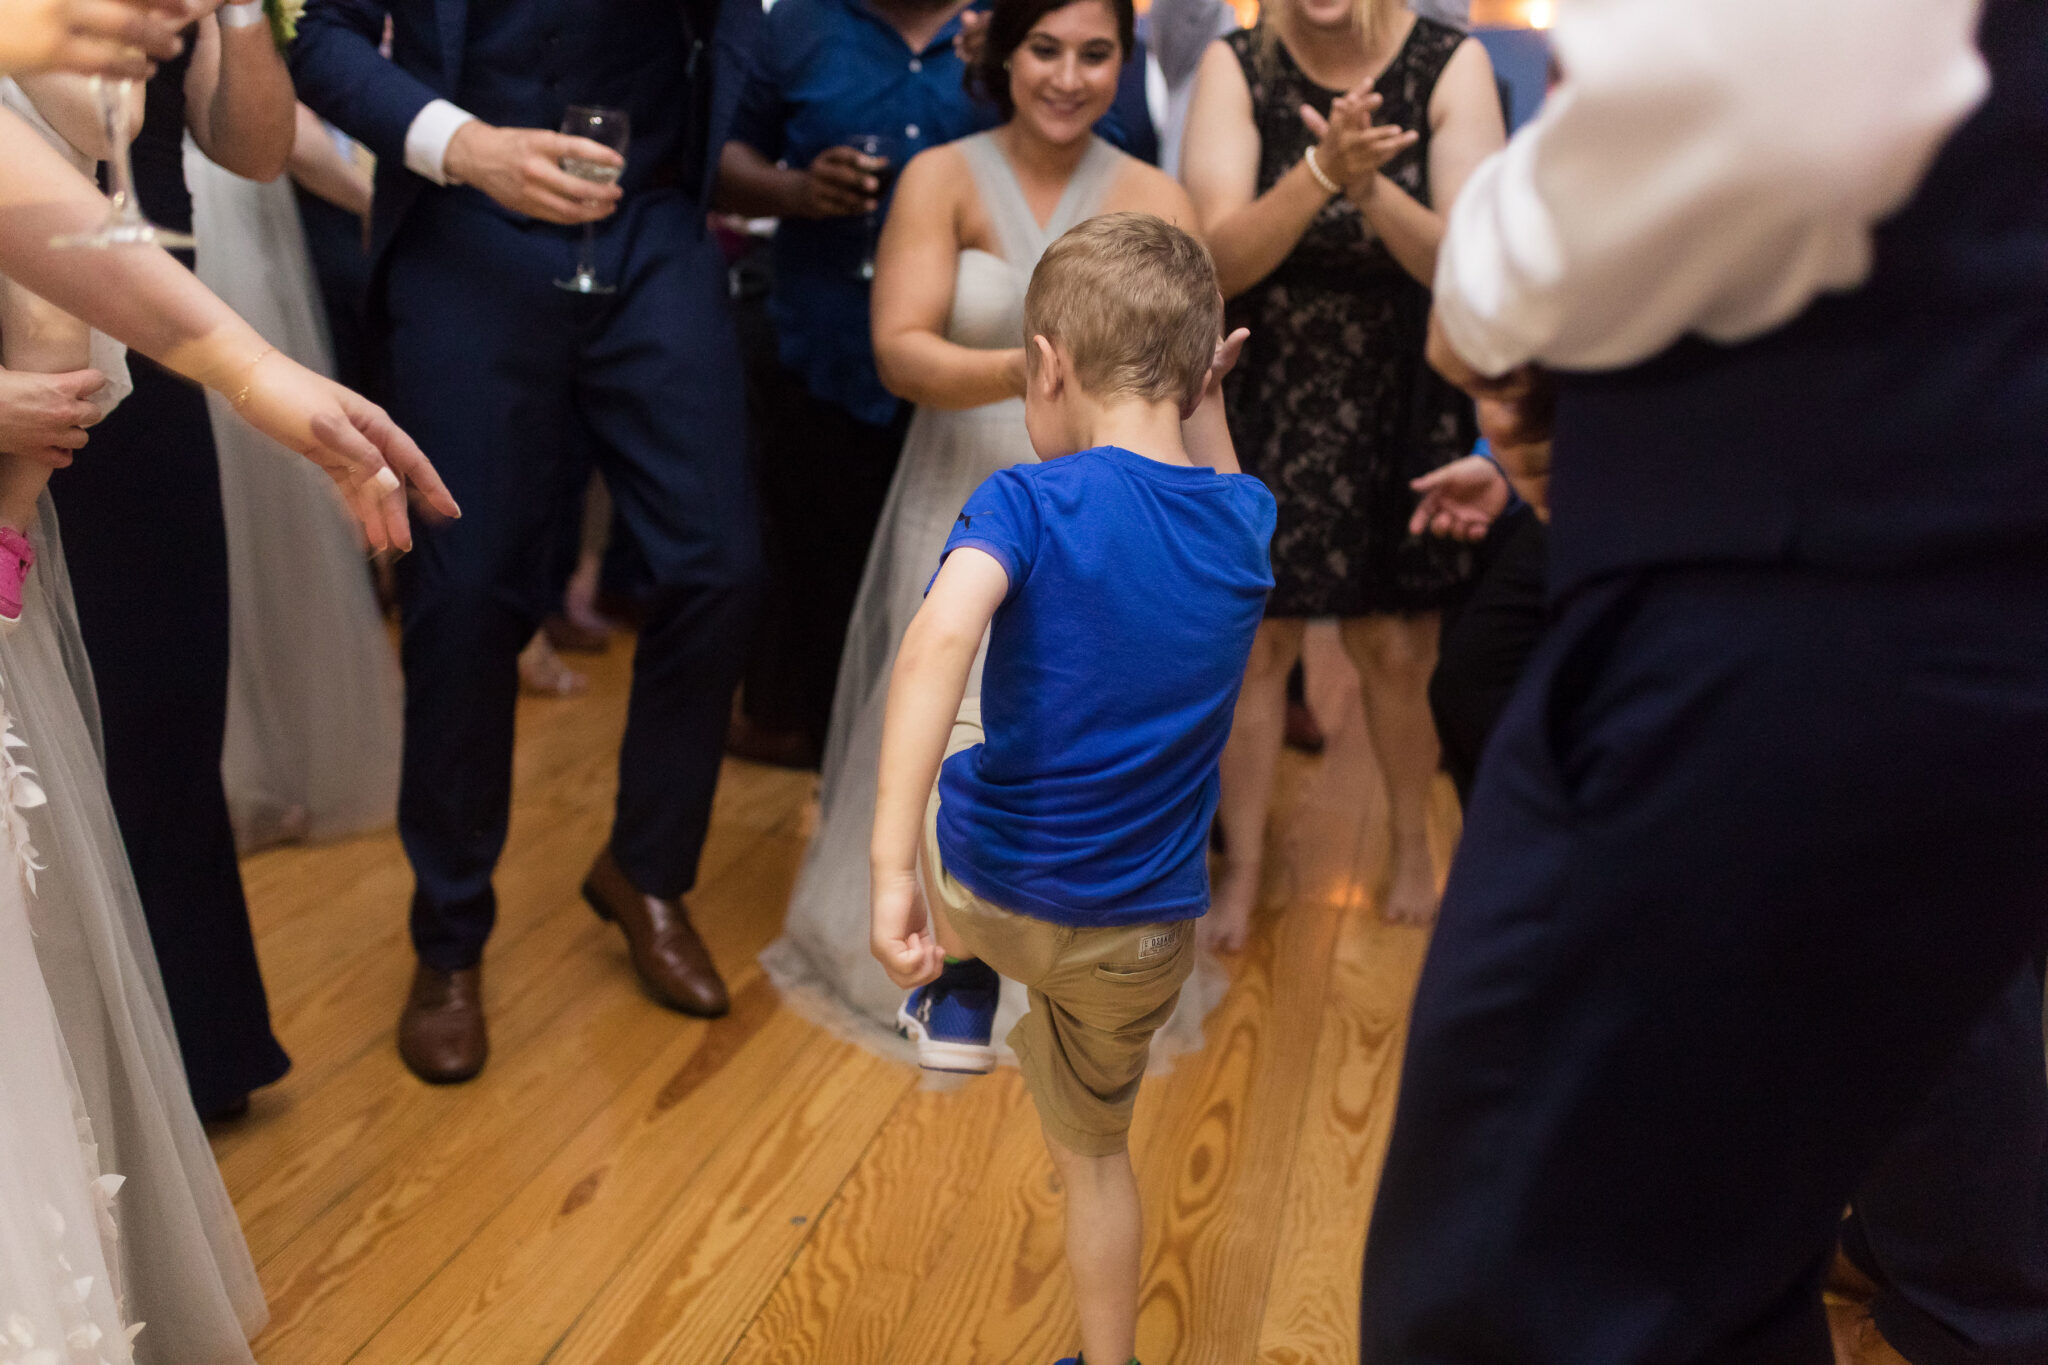 katie-alex-wedding-reception-dancing-222